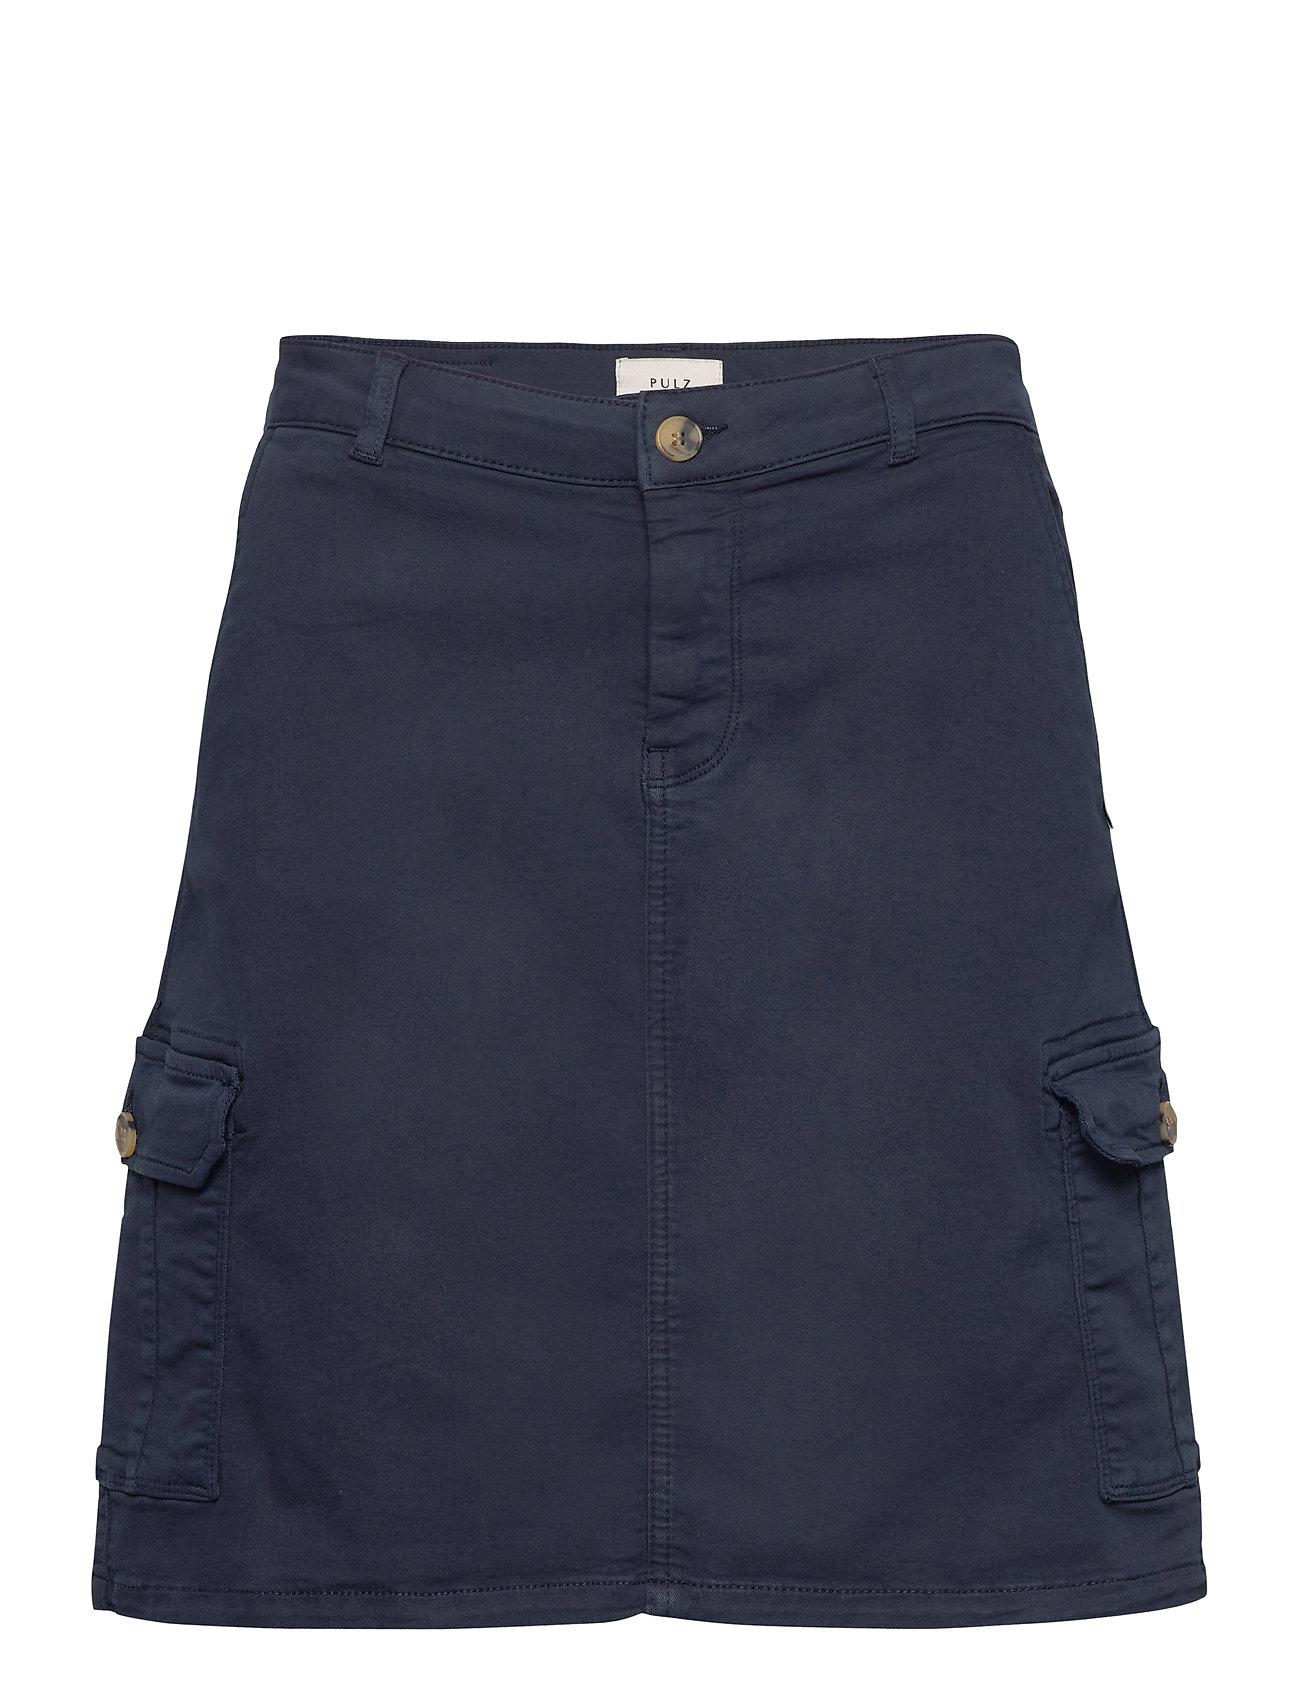 Image of Pzkarolina Skirt Kort Nederdel Blå Pulz Jeans (3413355771)